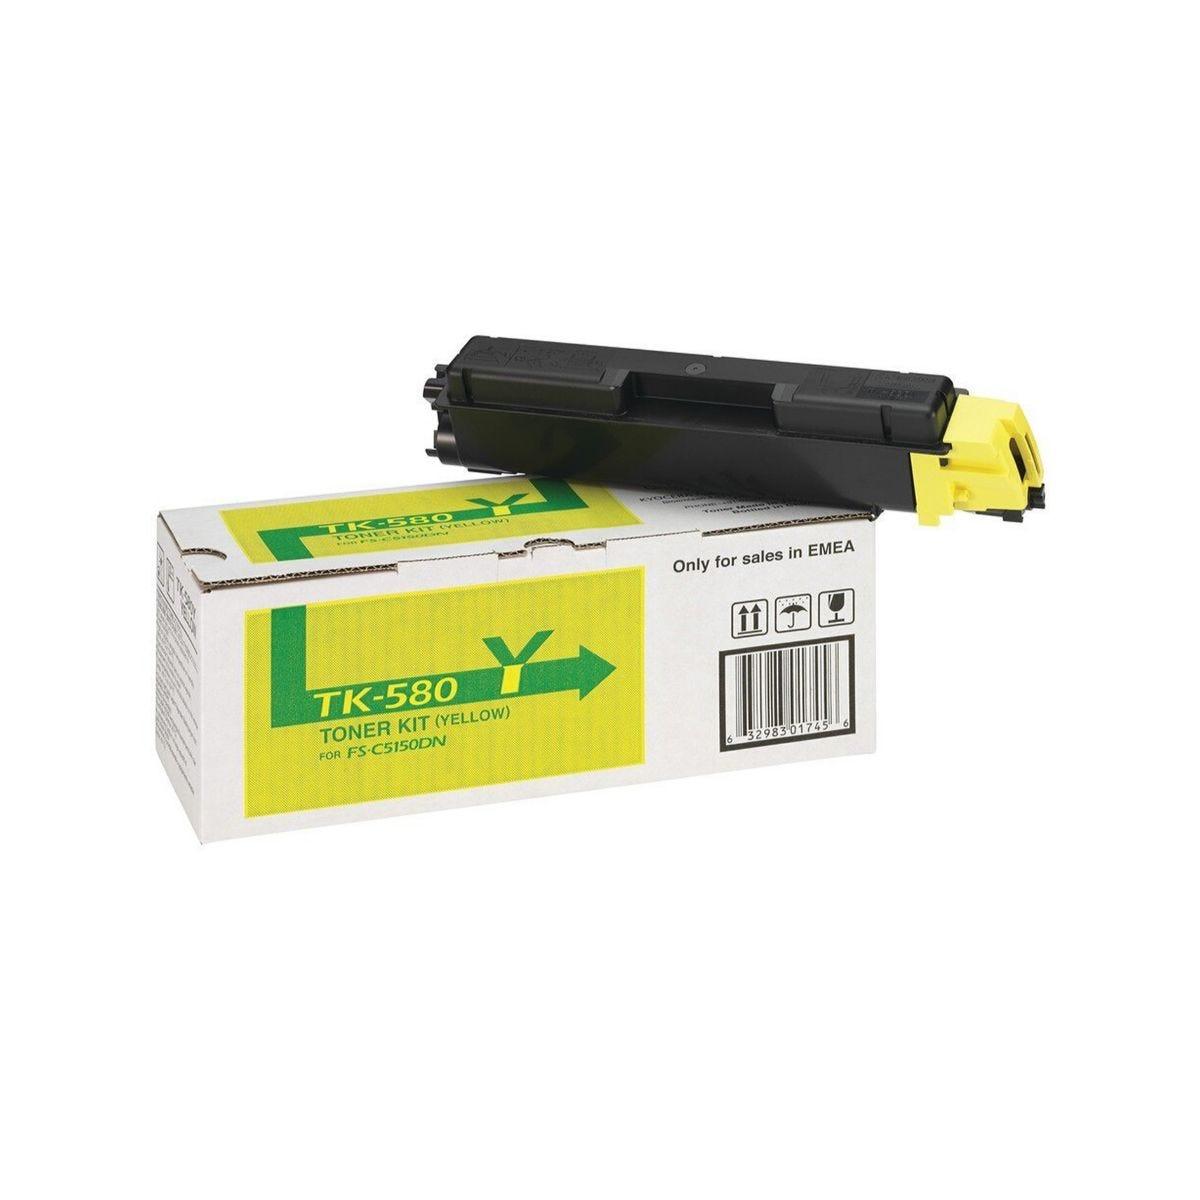 Image of Kyocera FS-C5150DN Toner Yellow, Yellow